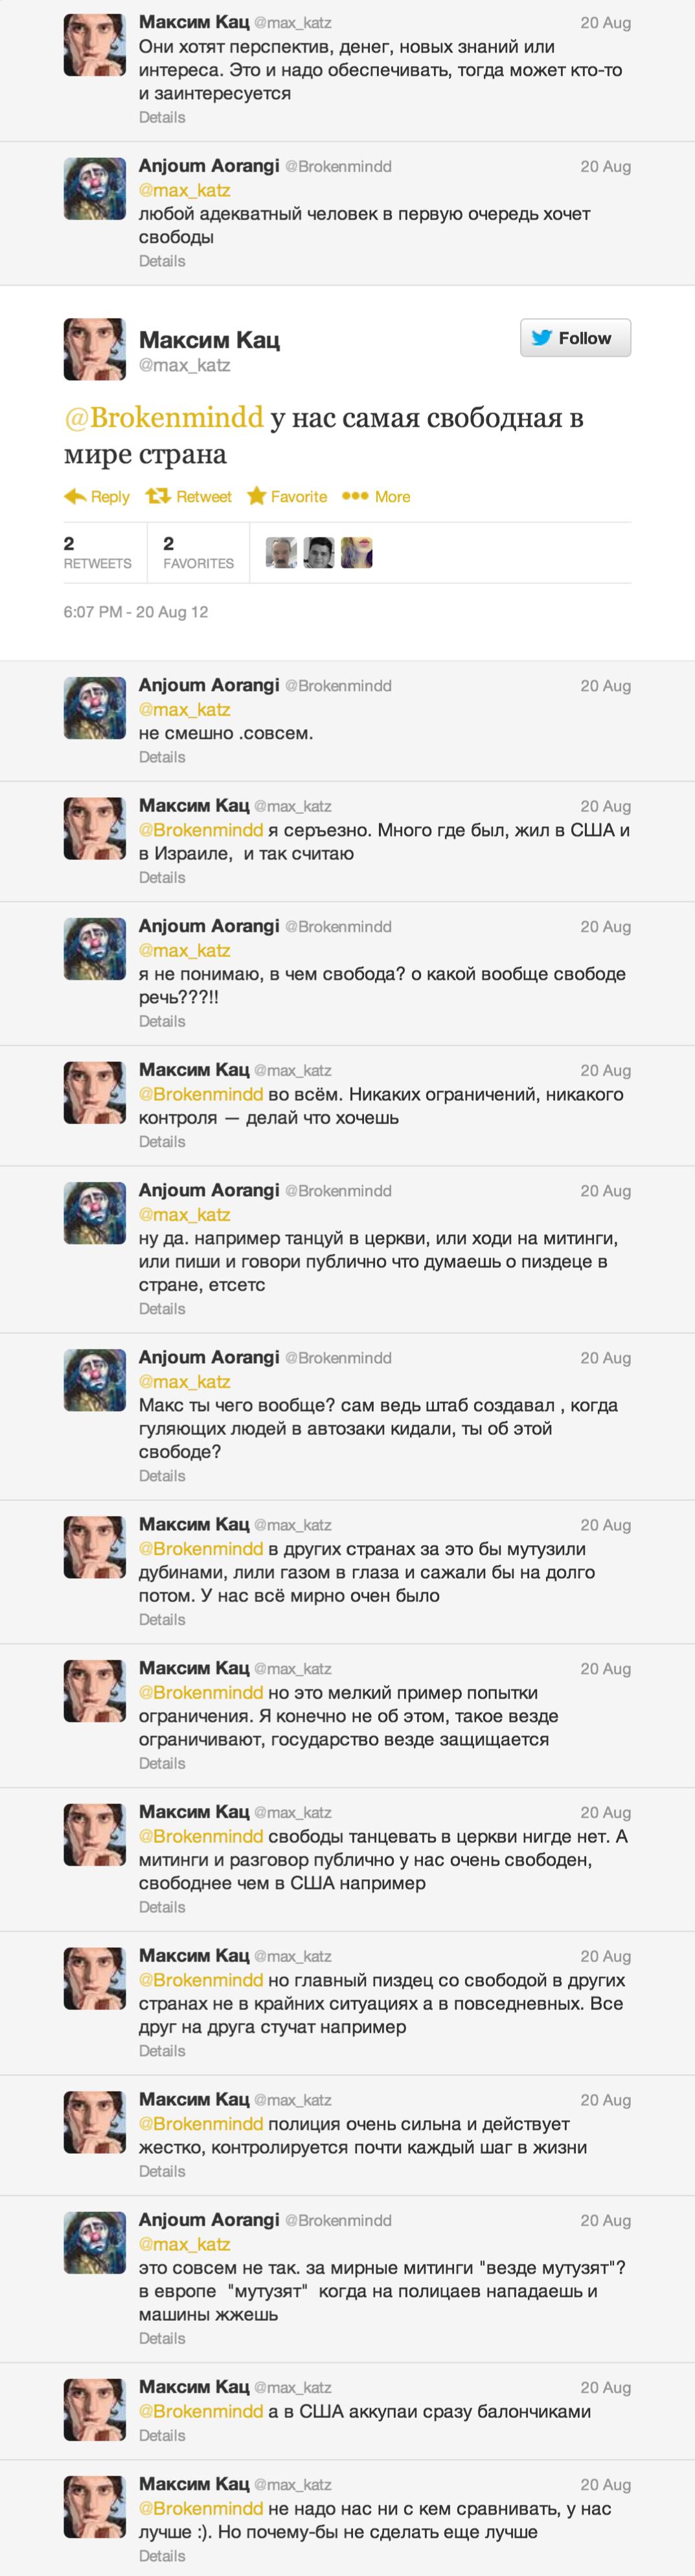 Ахеджакова, Лия Меджидовна Википедия